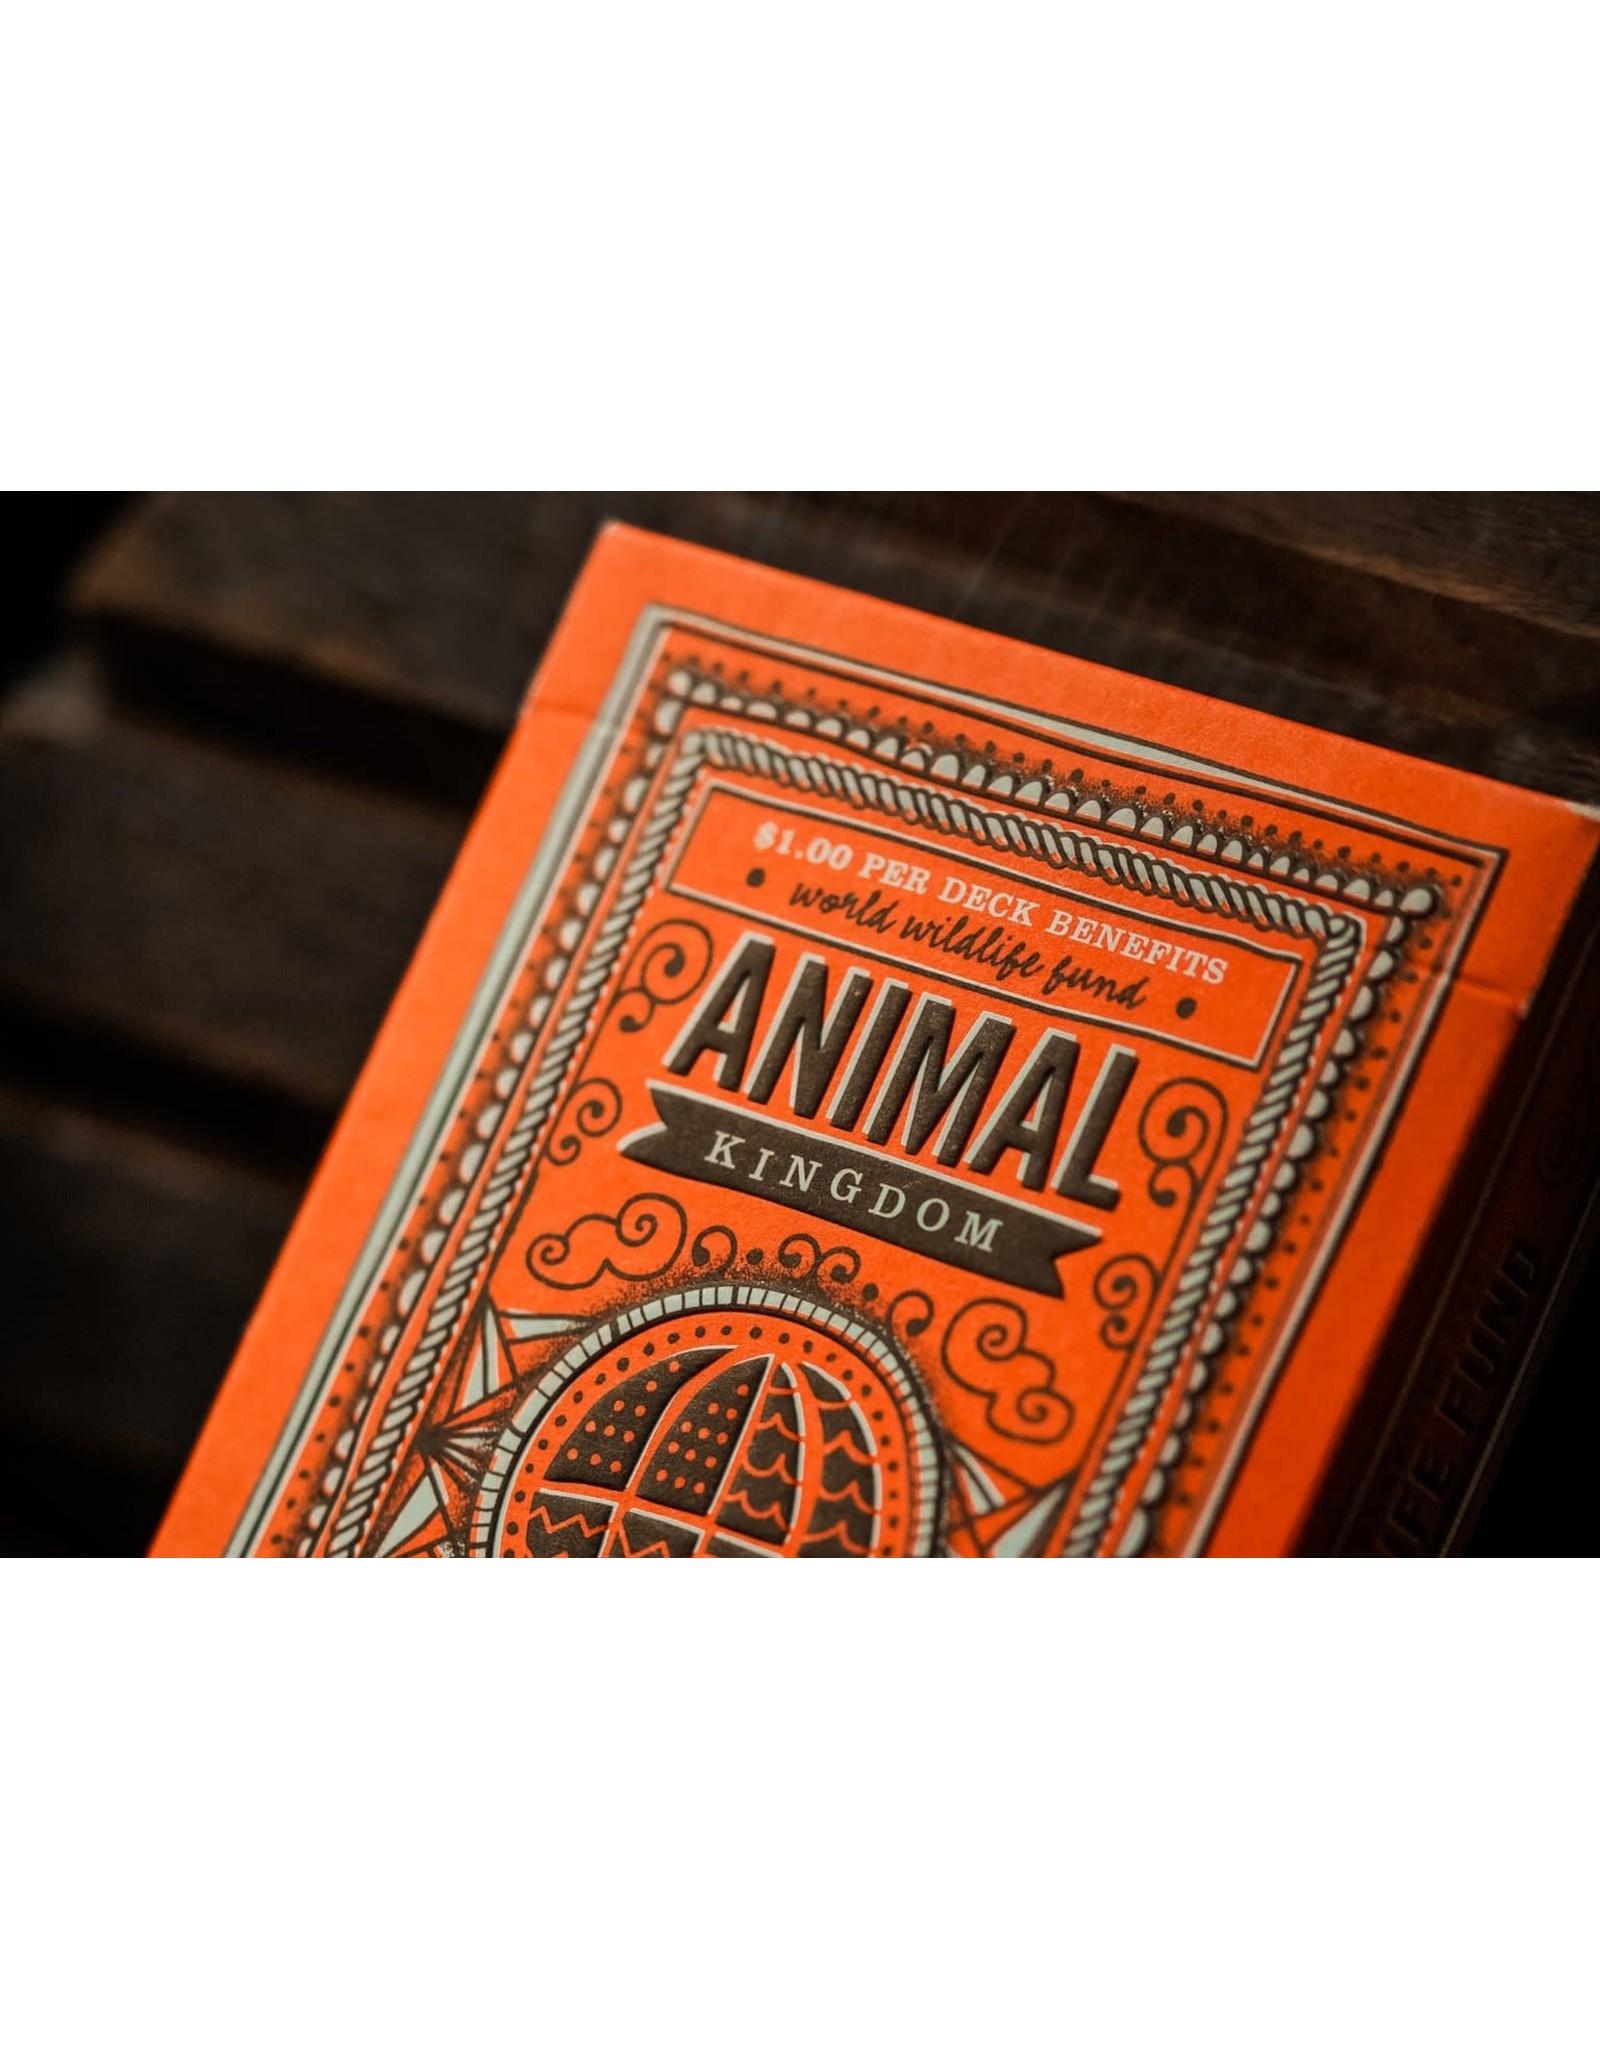 Theory 11 Animal Kingdom Playing Cards